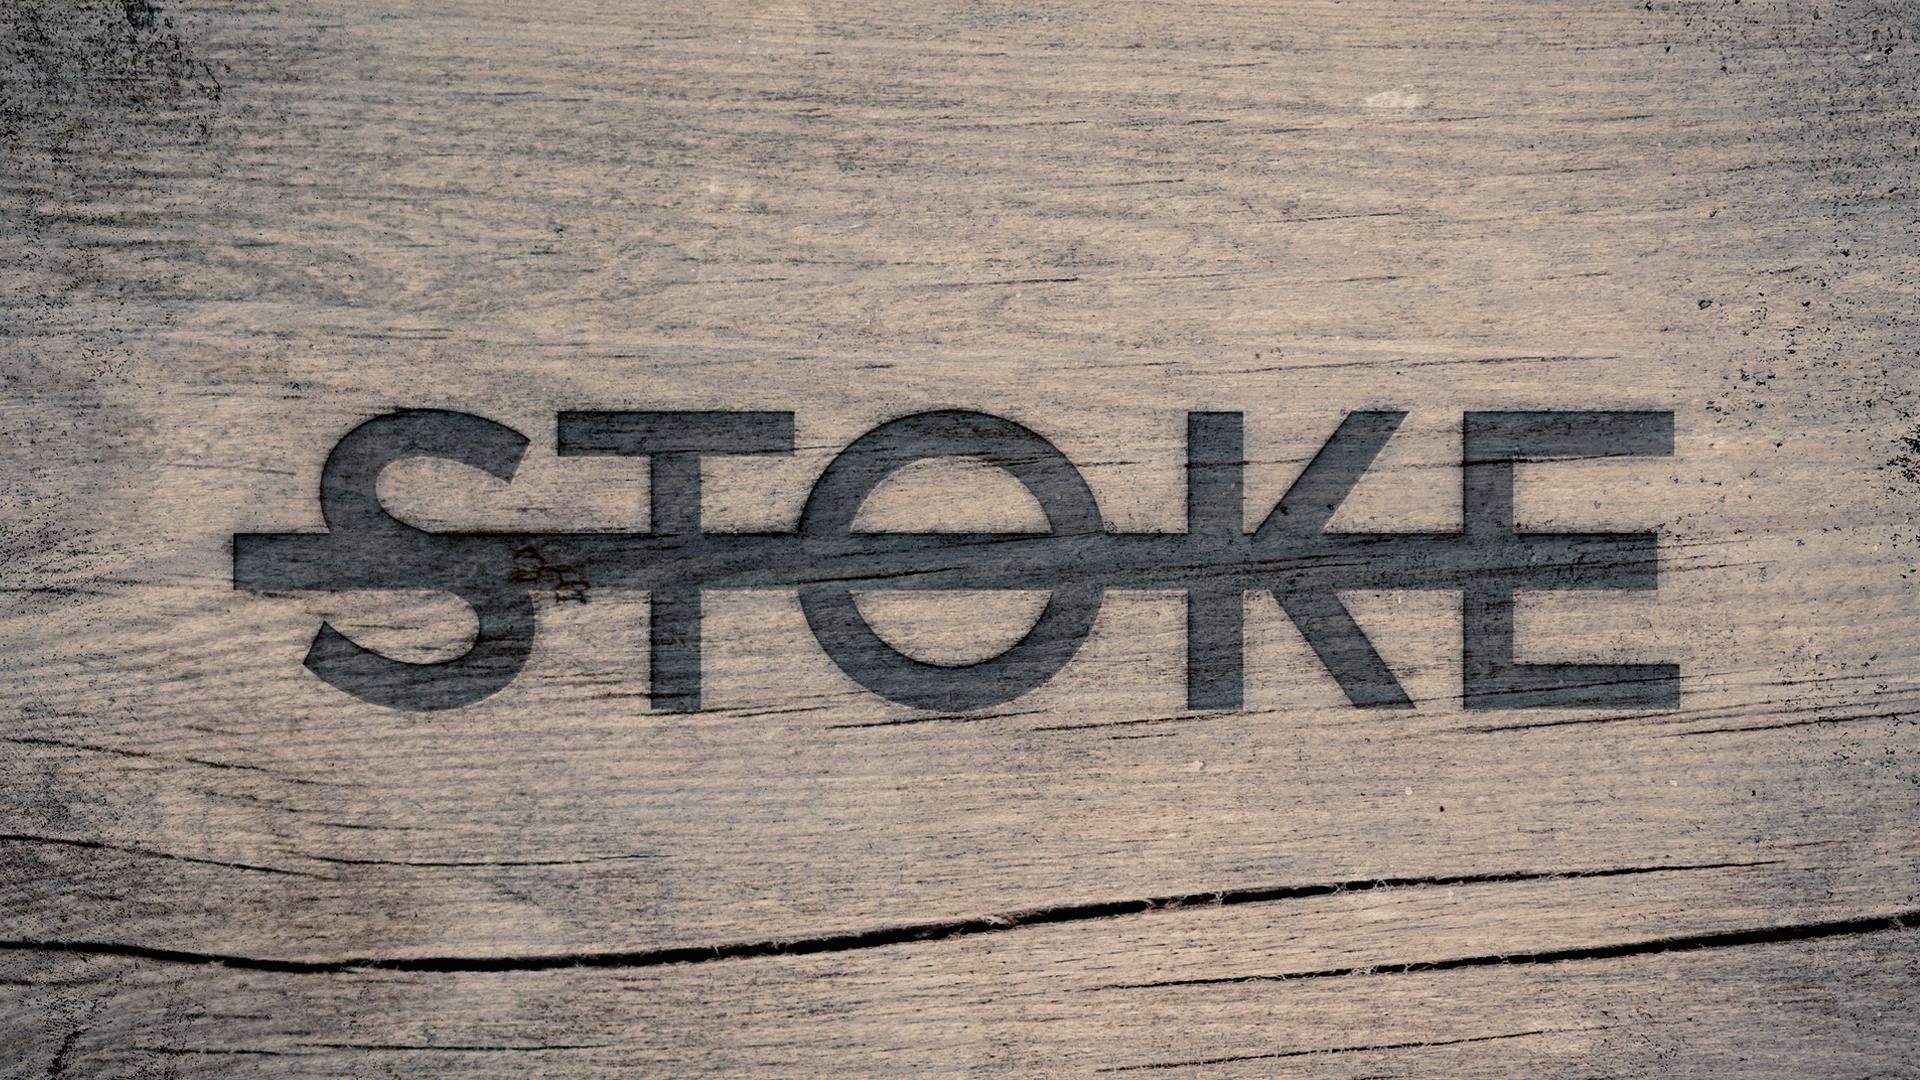 Logo van Stoke. Houten achtergrond met ingebrande tekst STOKE.